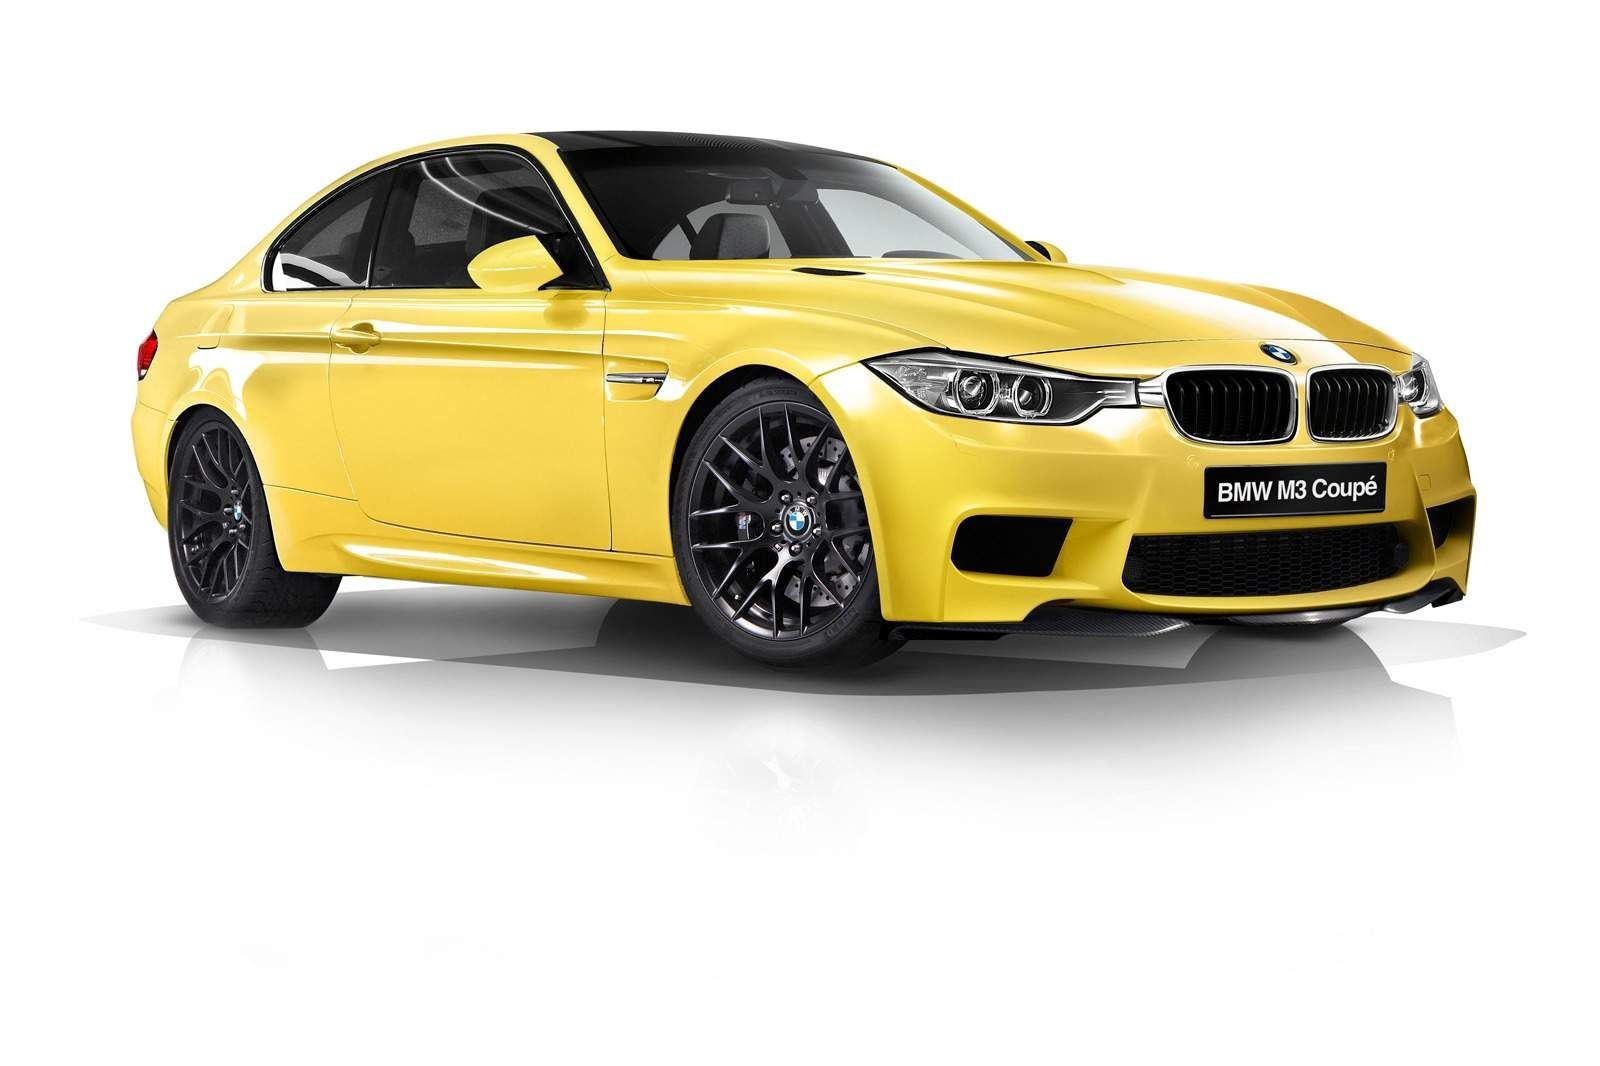 2014 Bmw M3 F80 Side Front View Yellow Yellowbmw 2014bmw